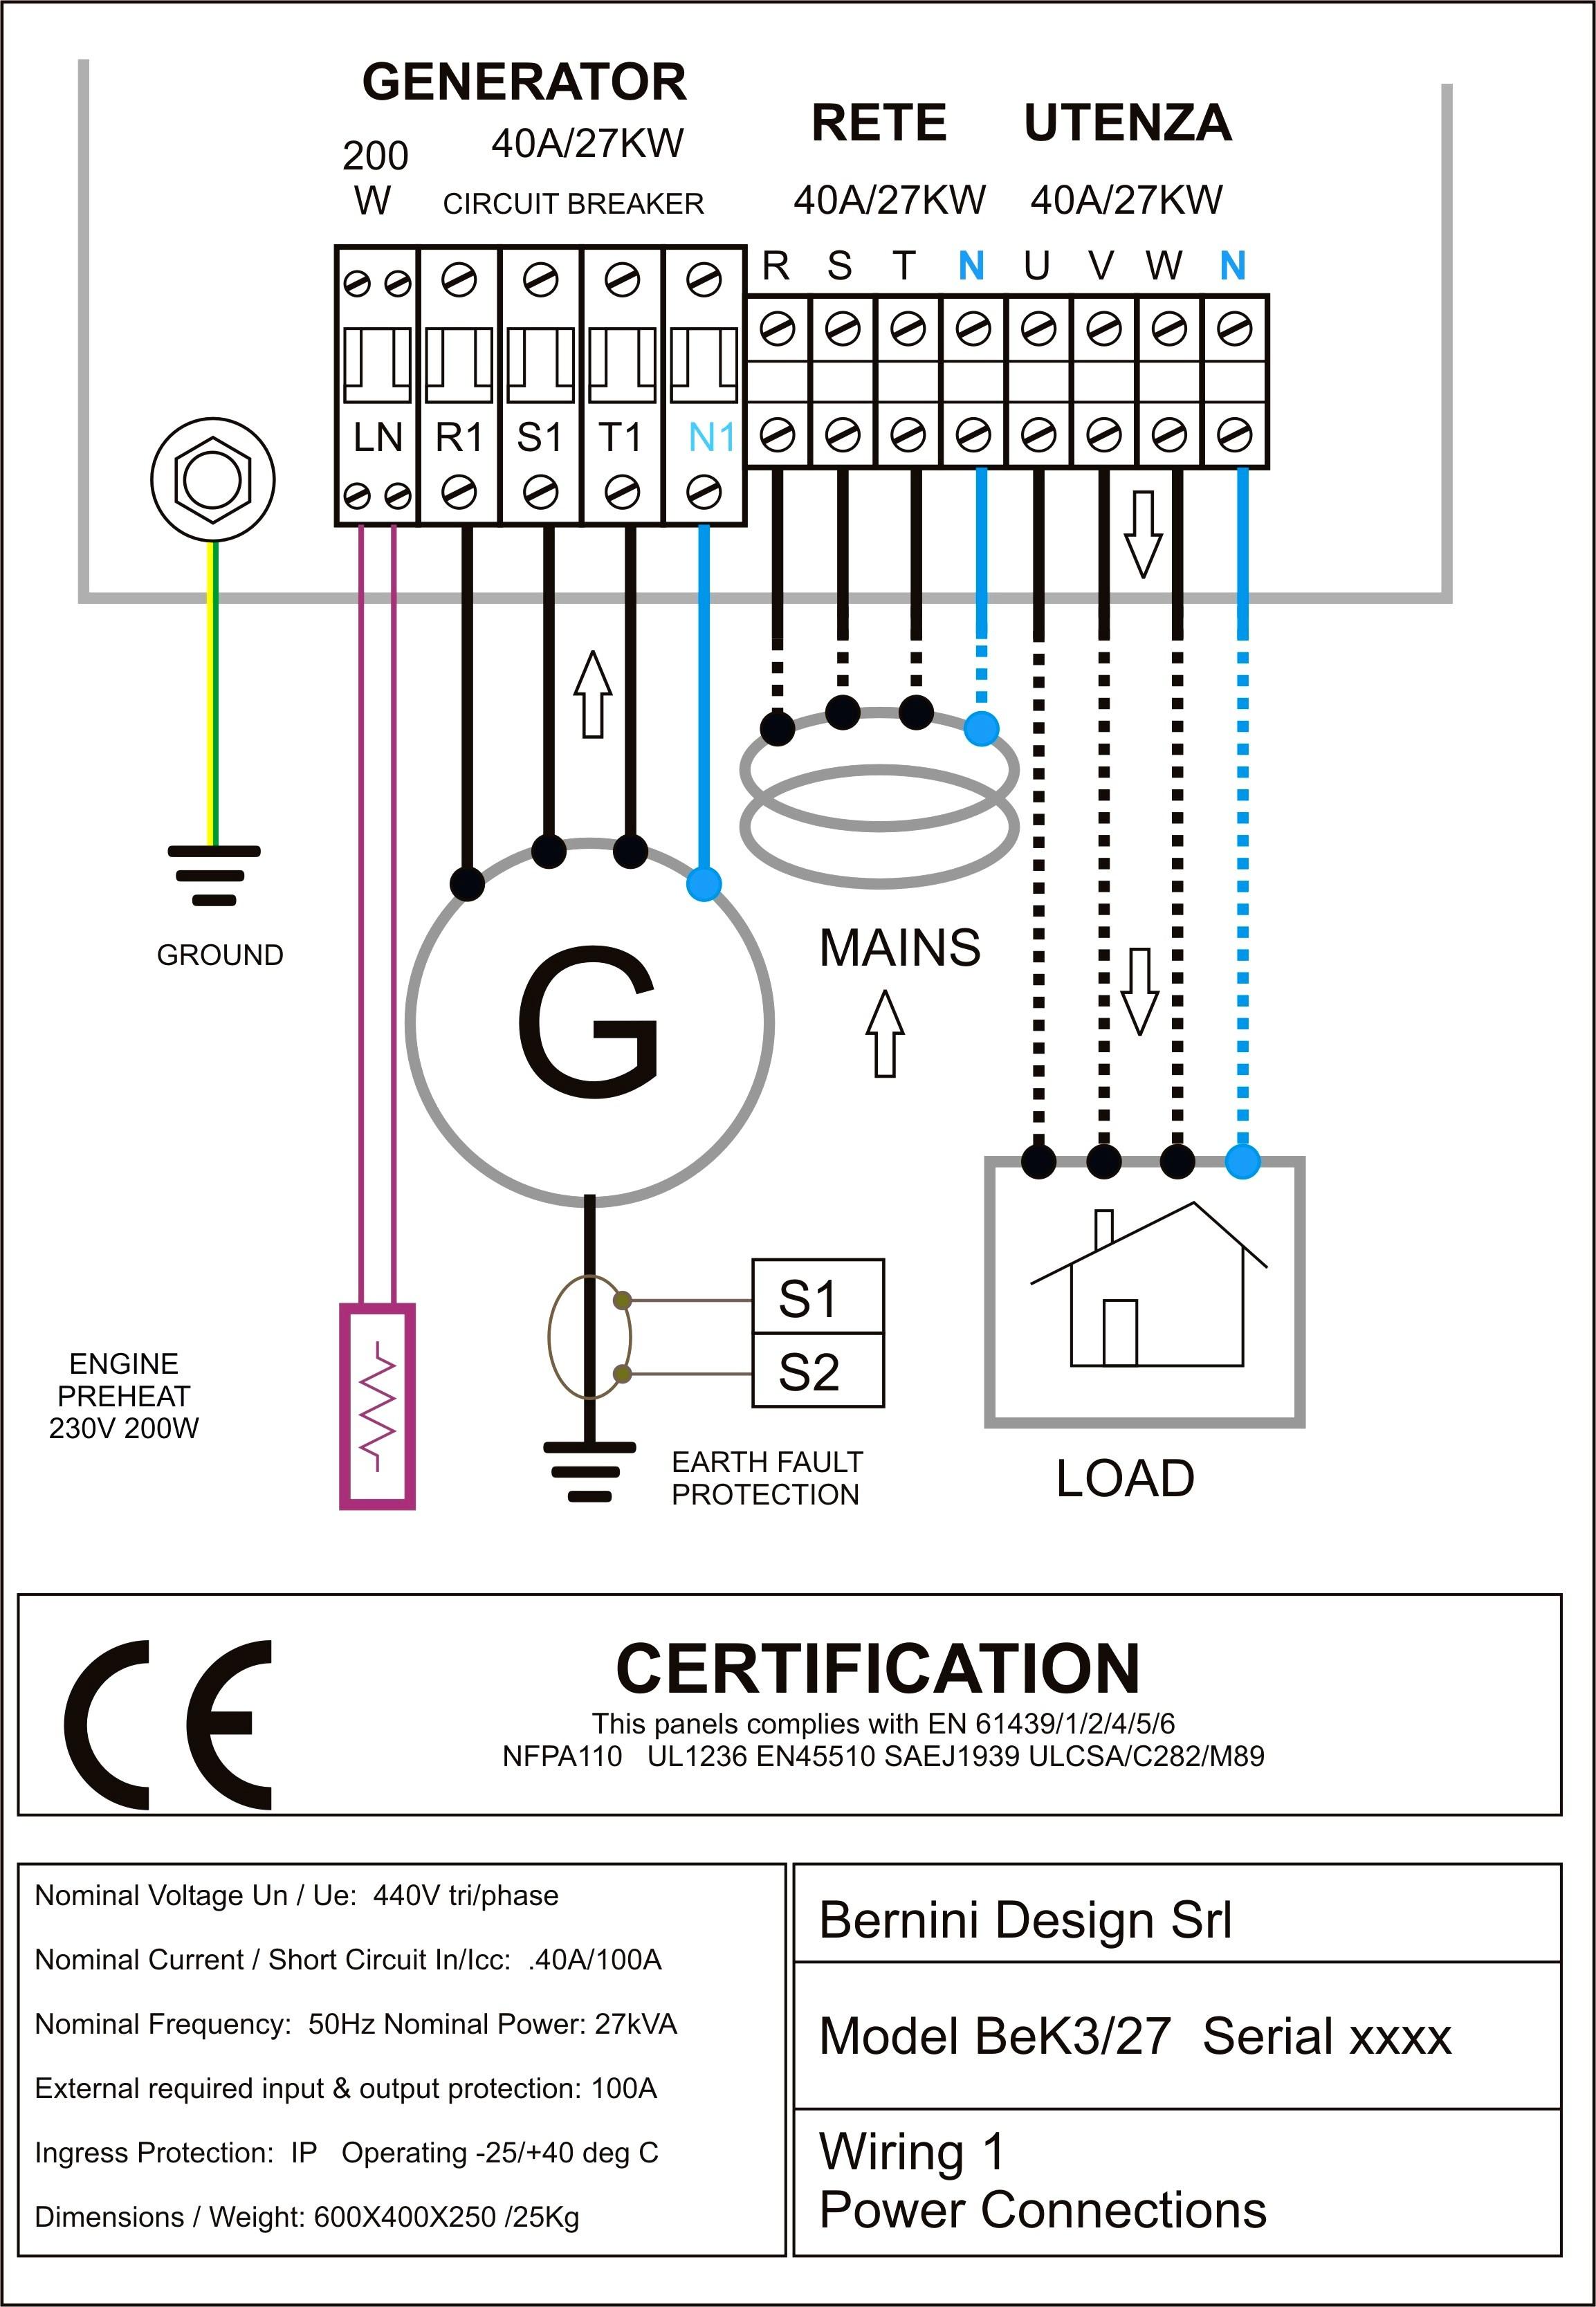 Ac Control Unit Wiring Electrical Diagrams A C Condenser Schematic Elegant Diagram Image